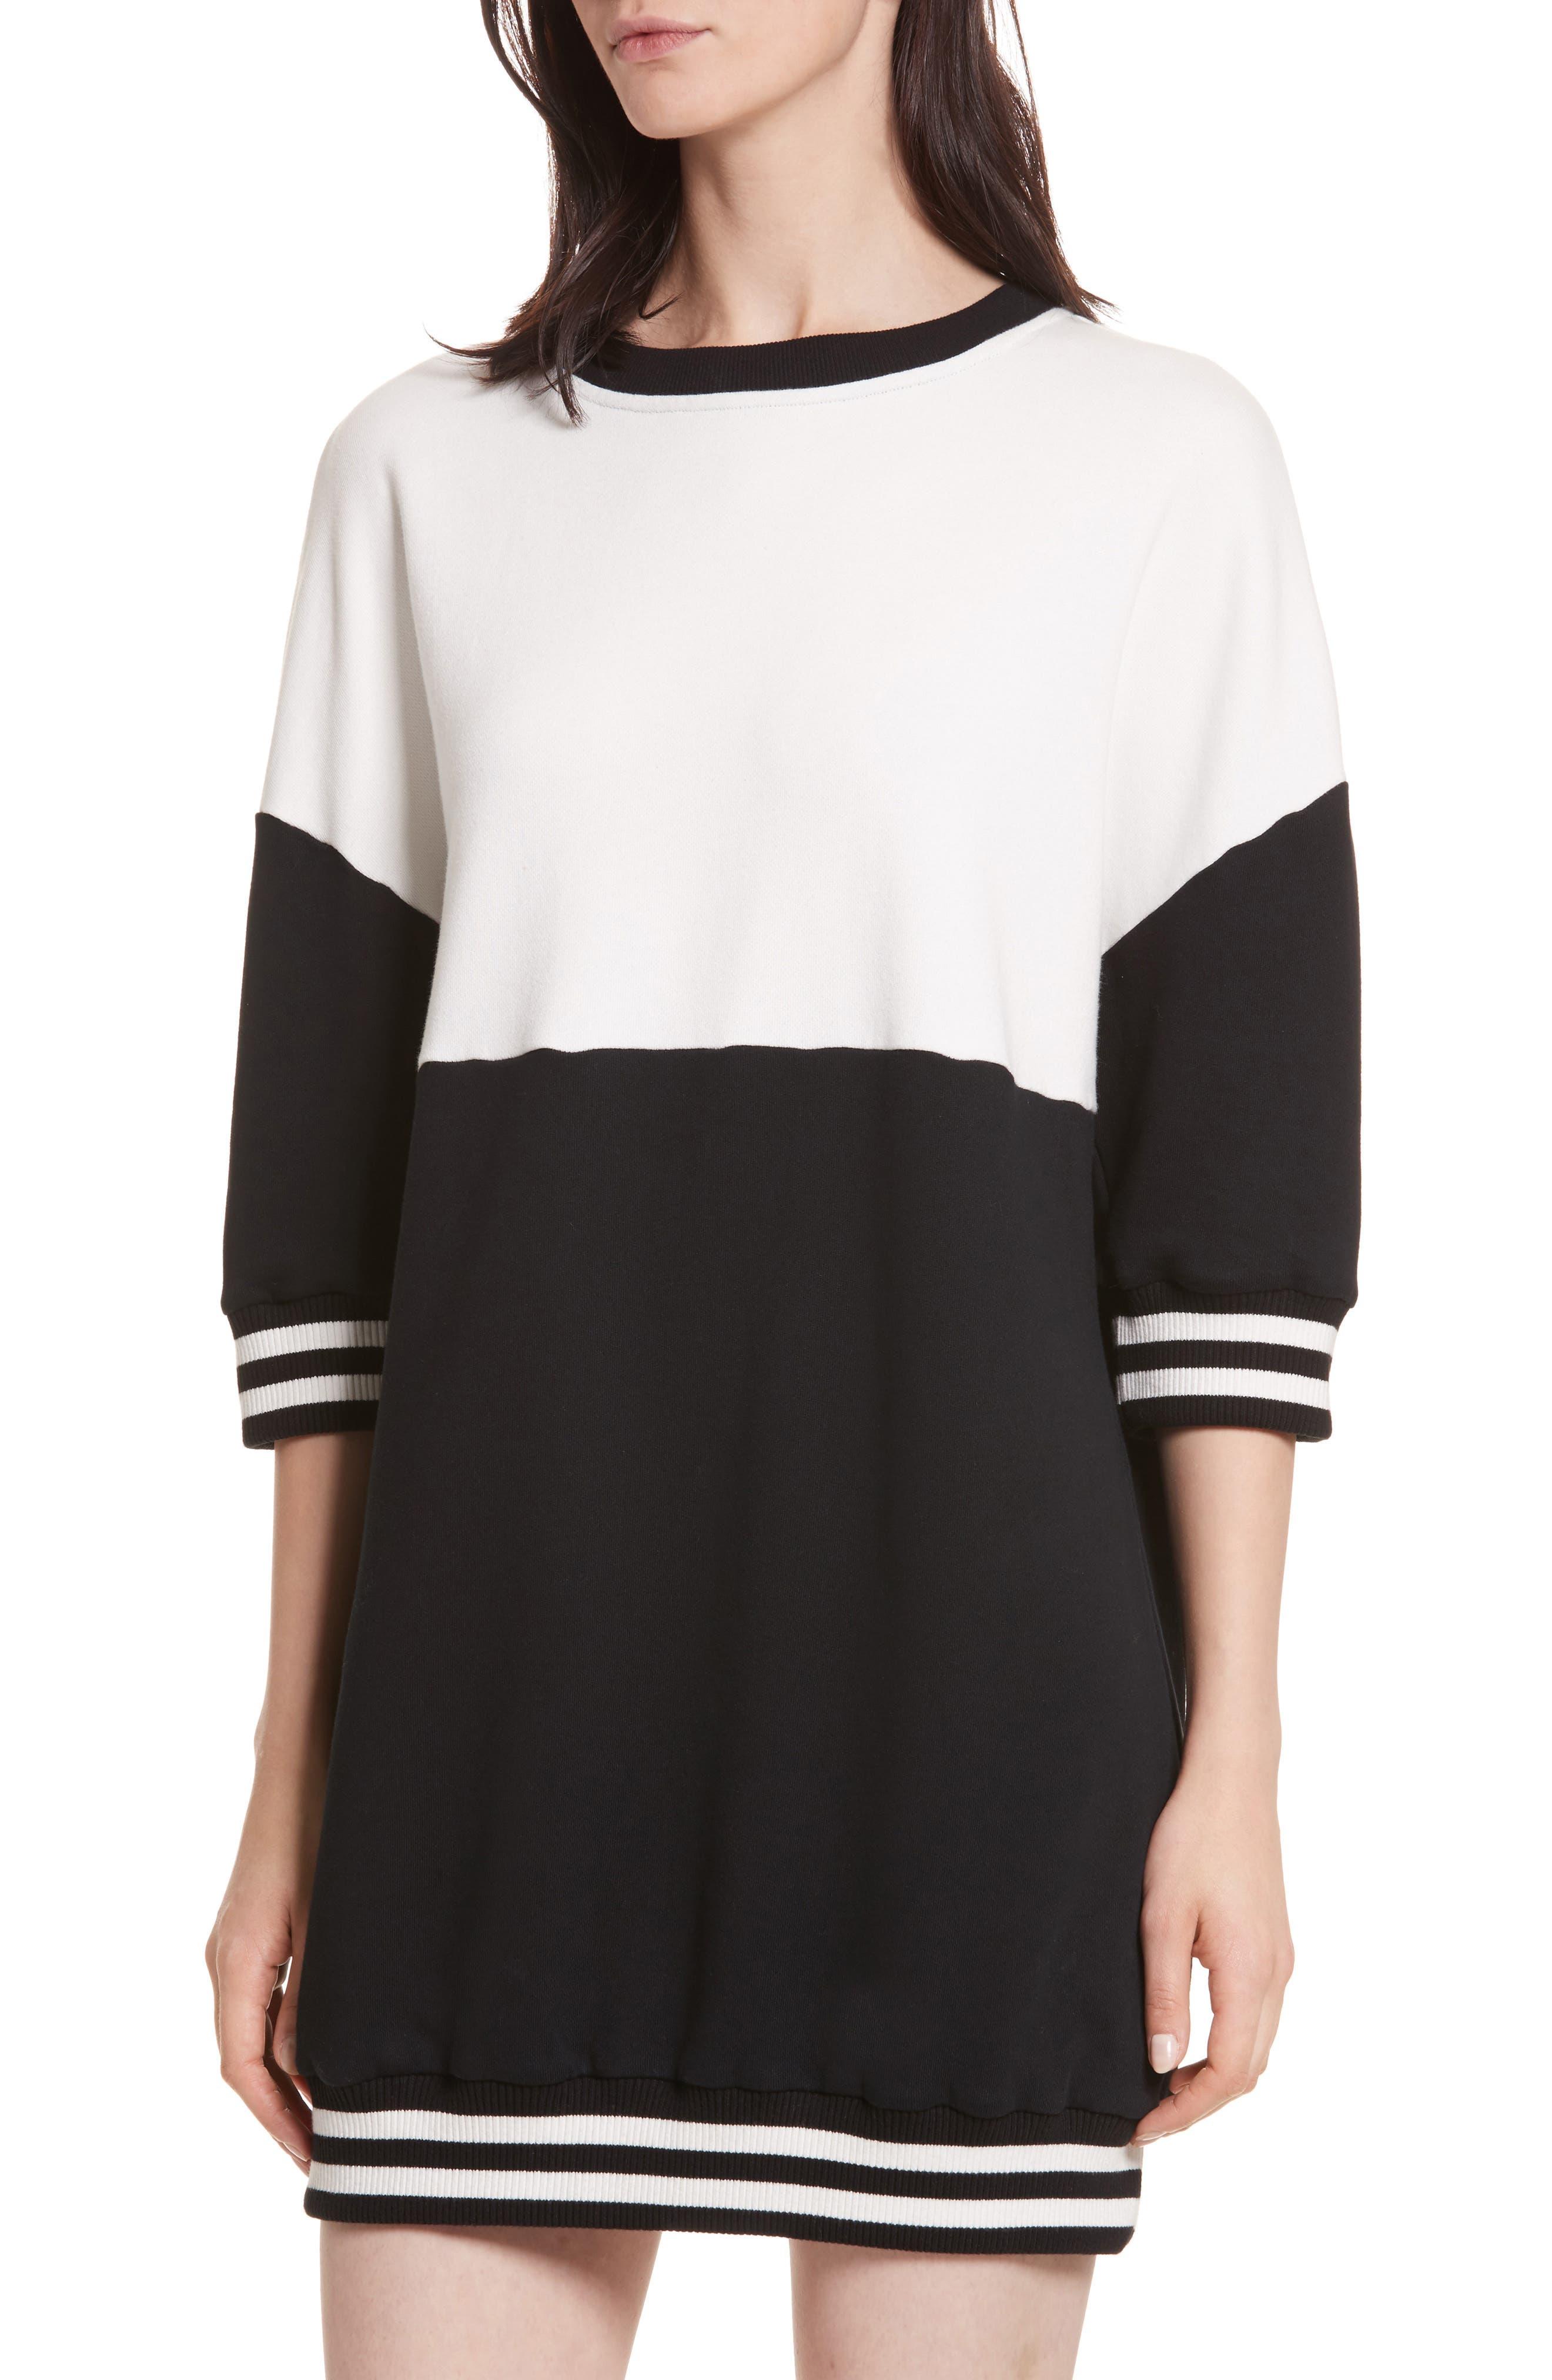 Gussie Colorblock Sweatshirt Dress,                             Alternate thumbnail 4, color,                             008